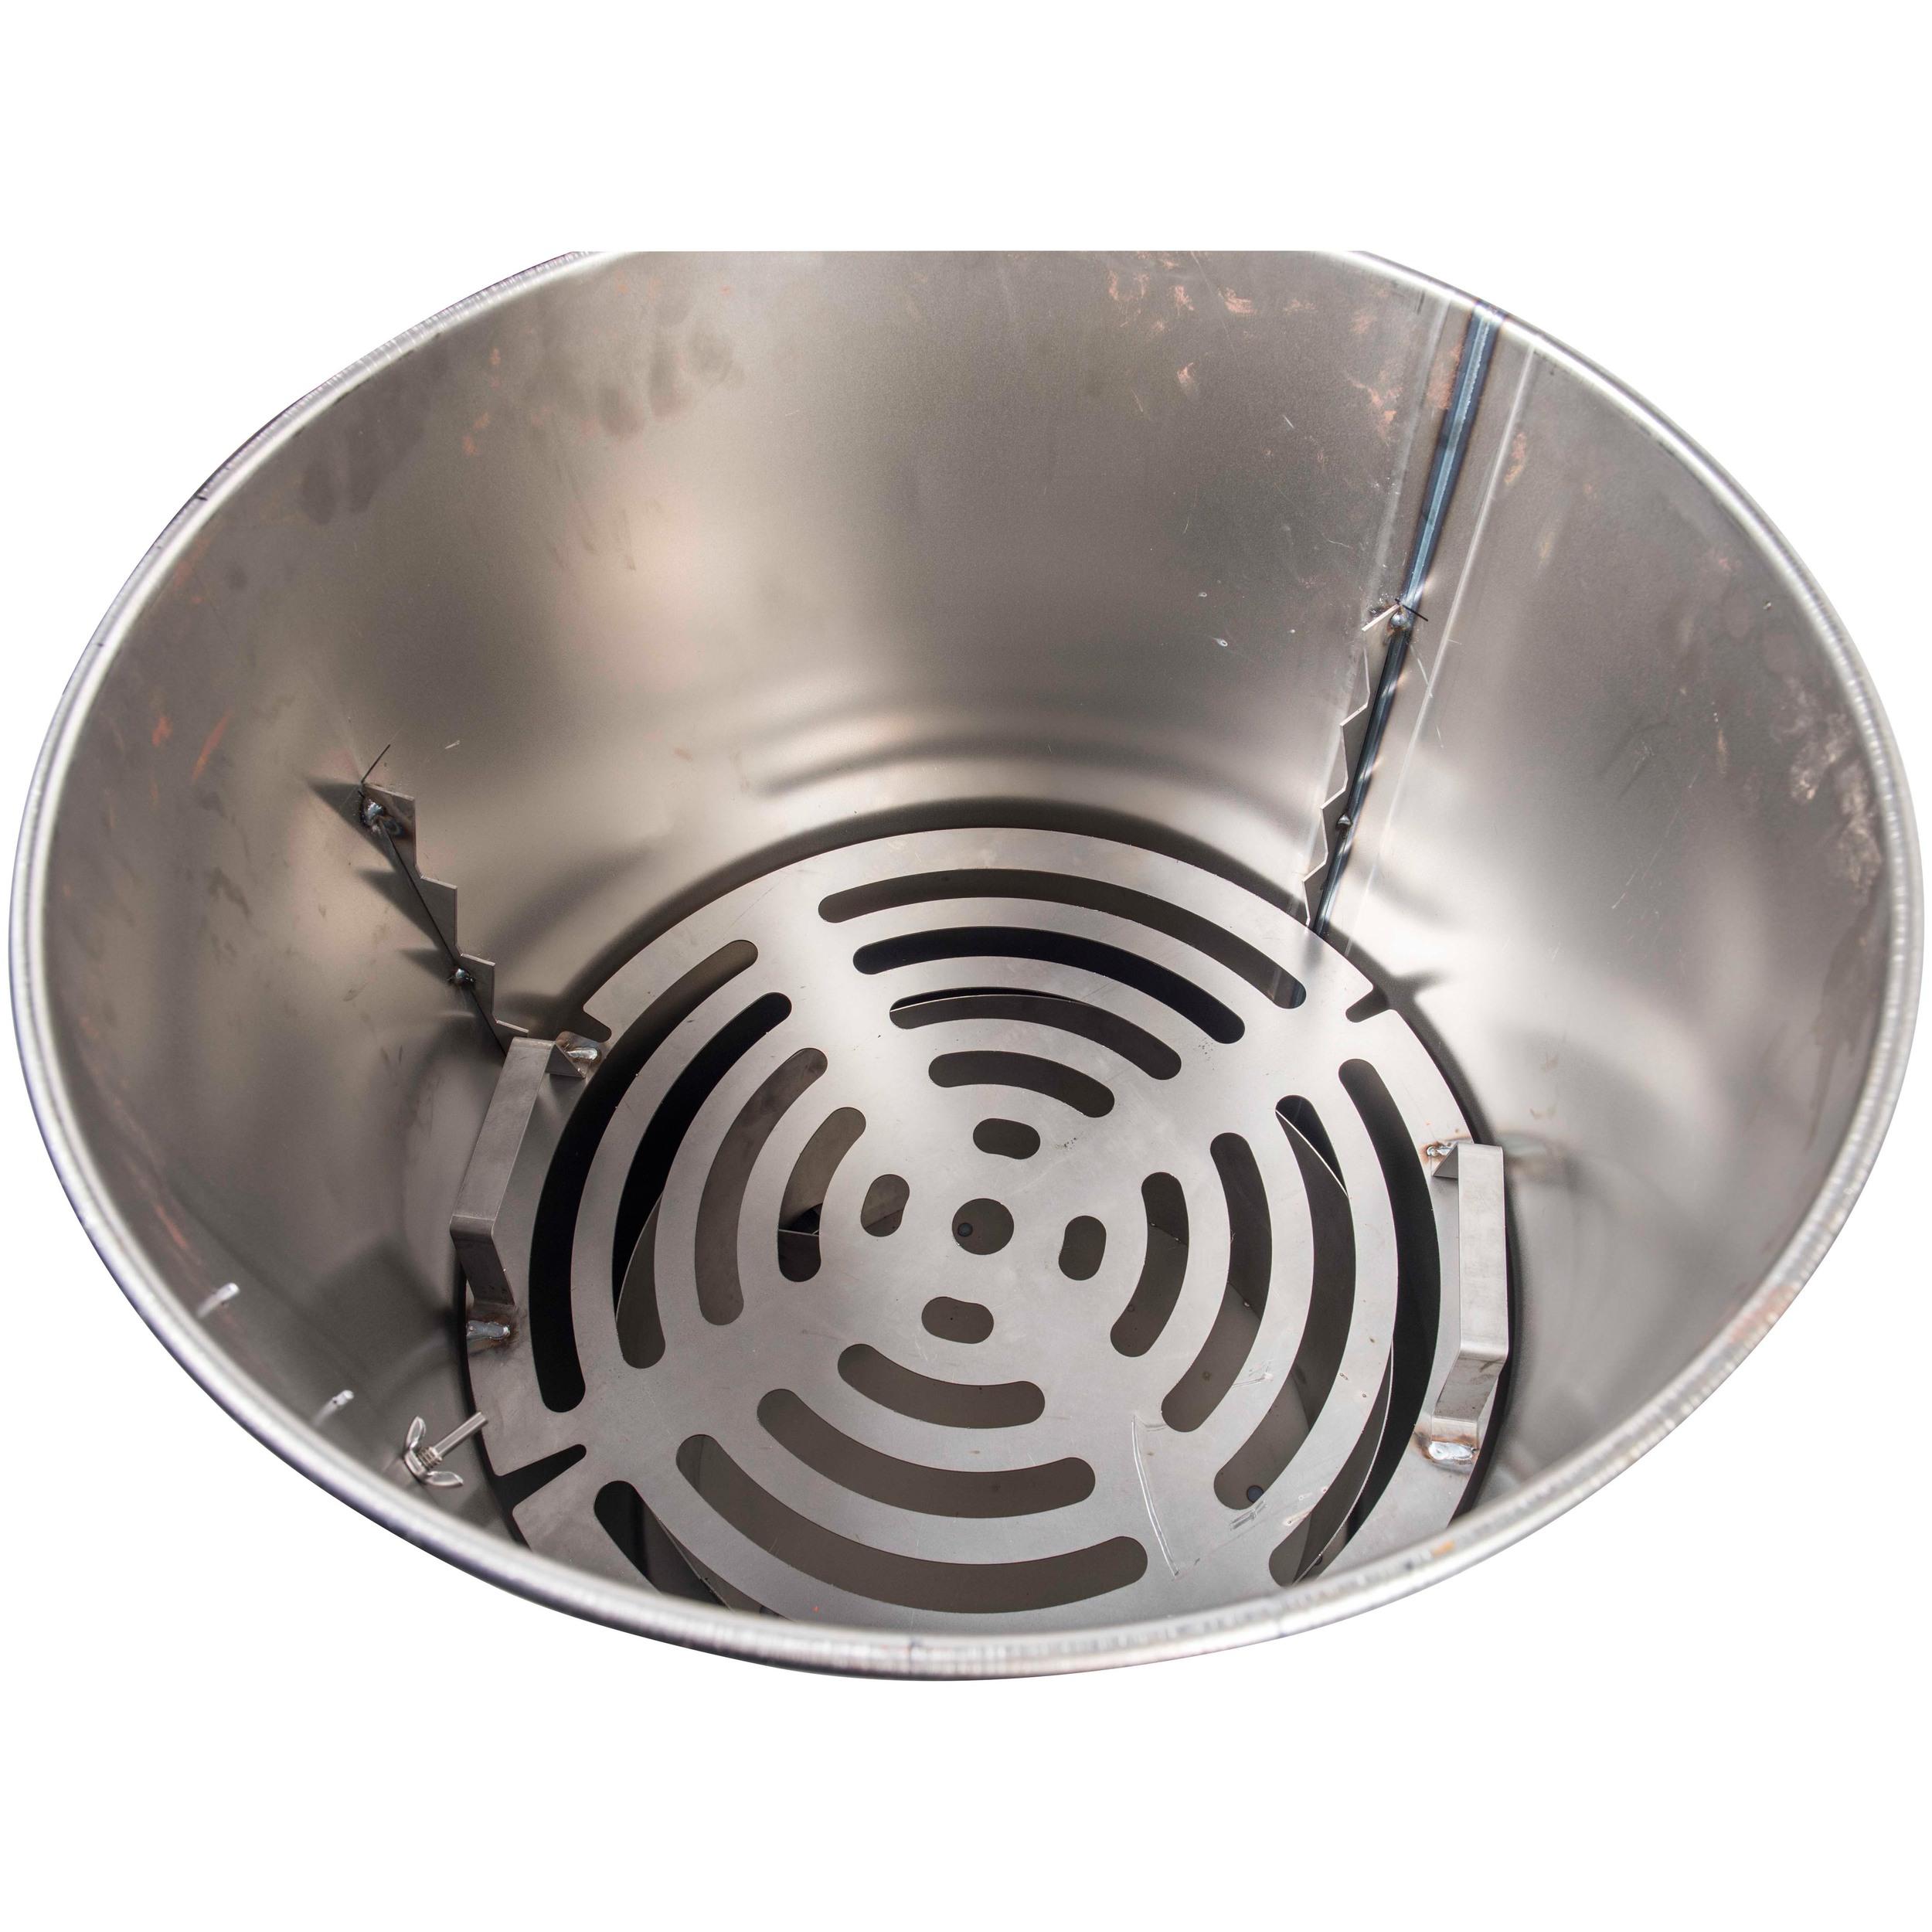 Heat Deflector Plate (shown inside drum)